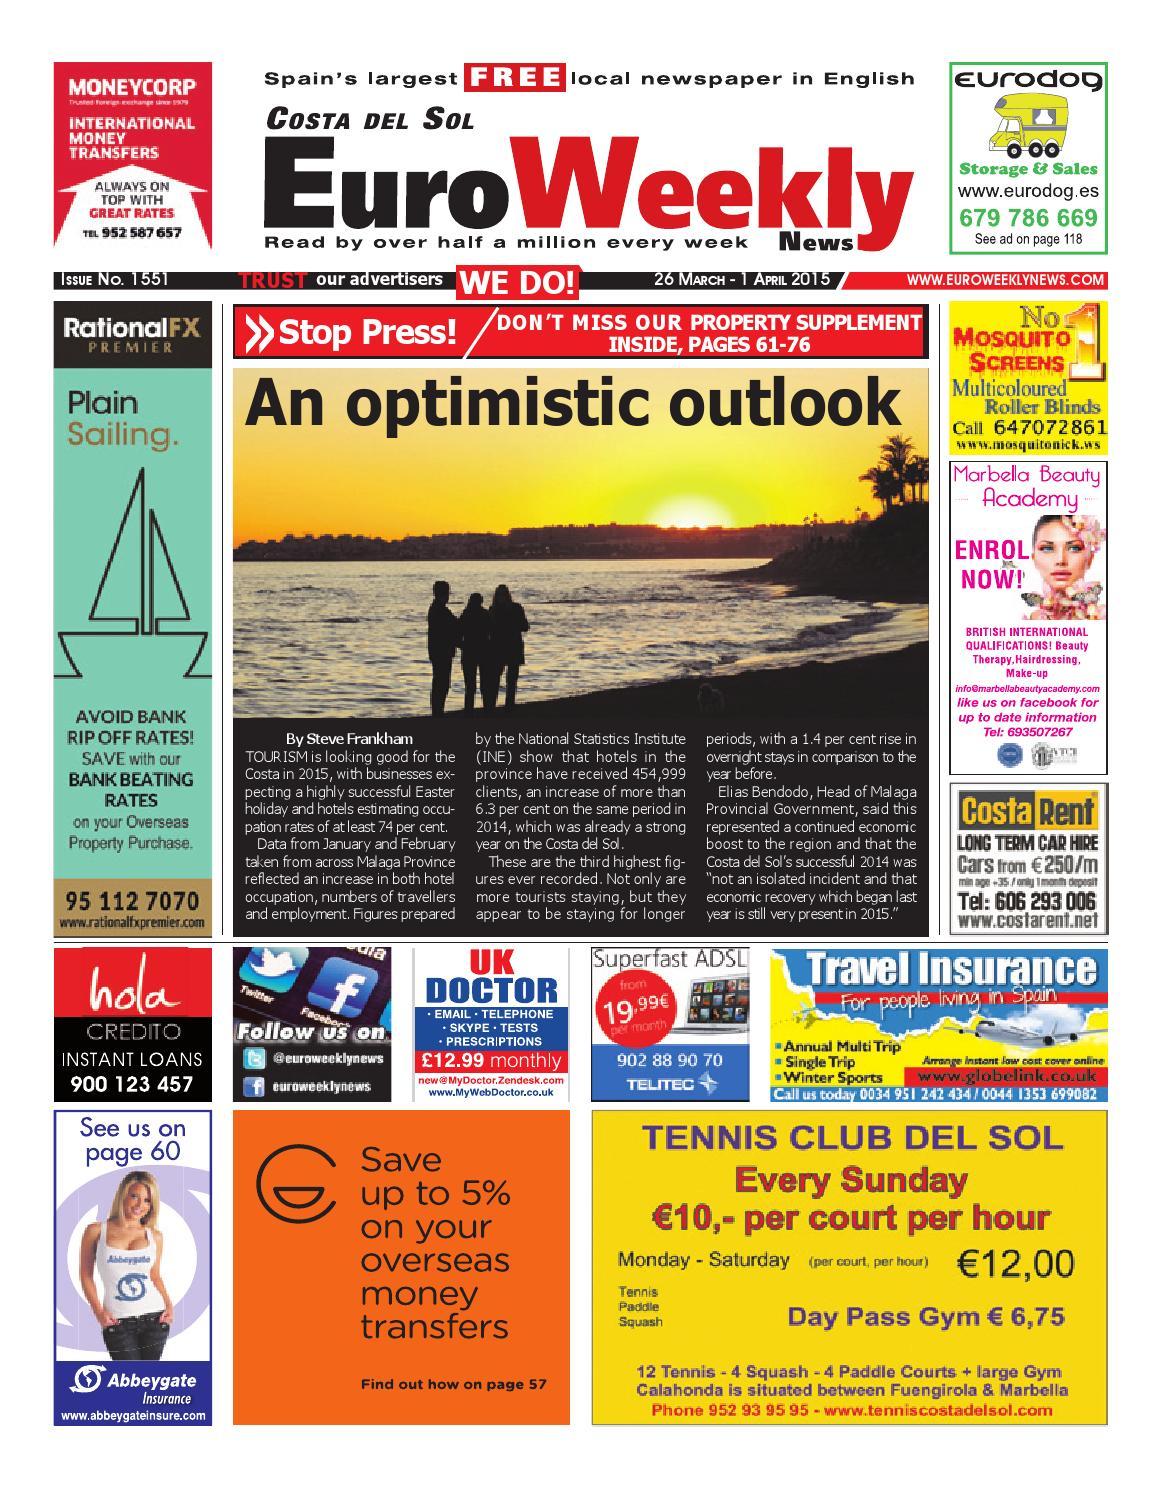 Euro weekly news costa del sol 26 march 1 april 2015 issue 1551 euro weekly news costa del sol 26 march 1 april 2015 issue 1551 by euro weekly news media sa issuu fandeluxe Gallery